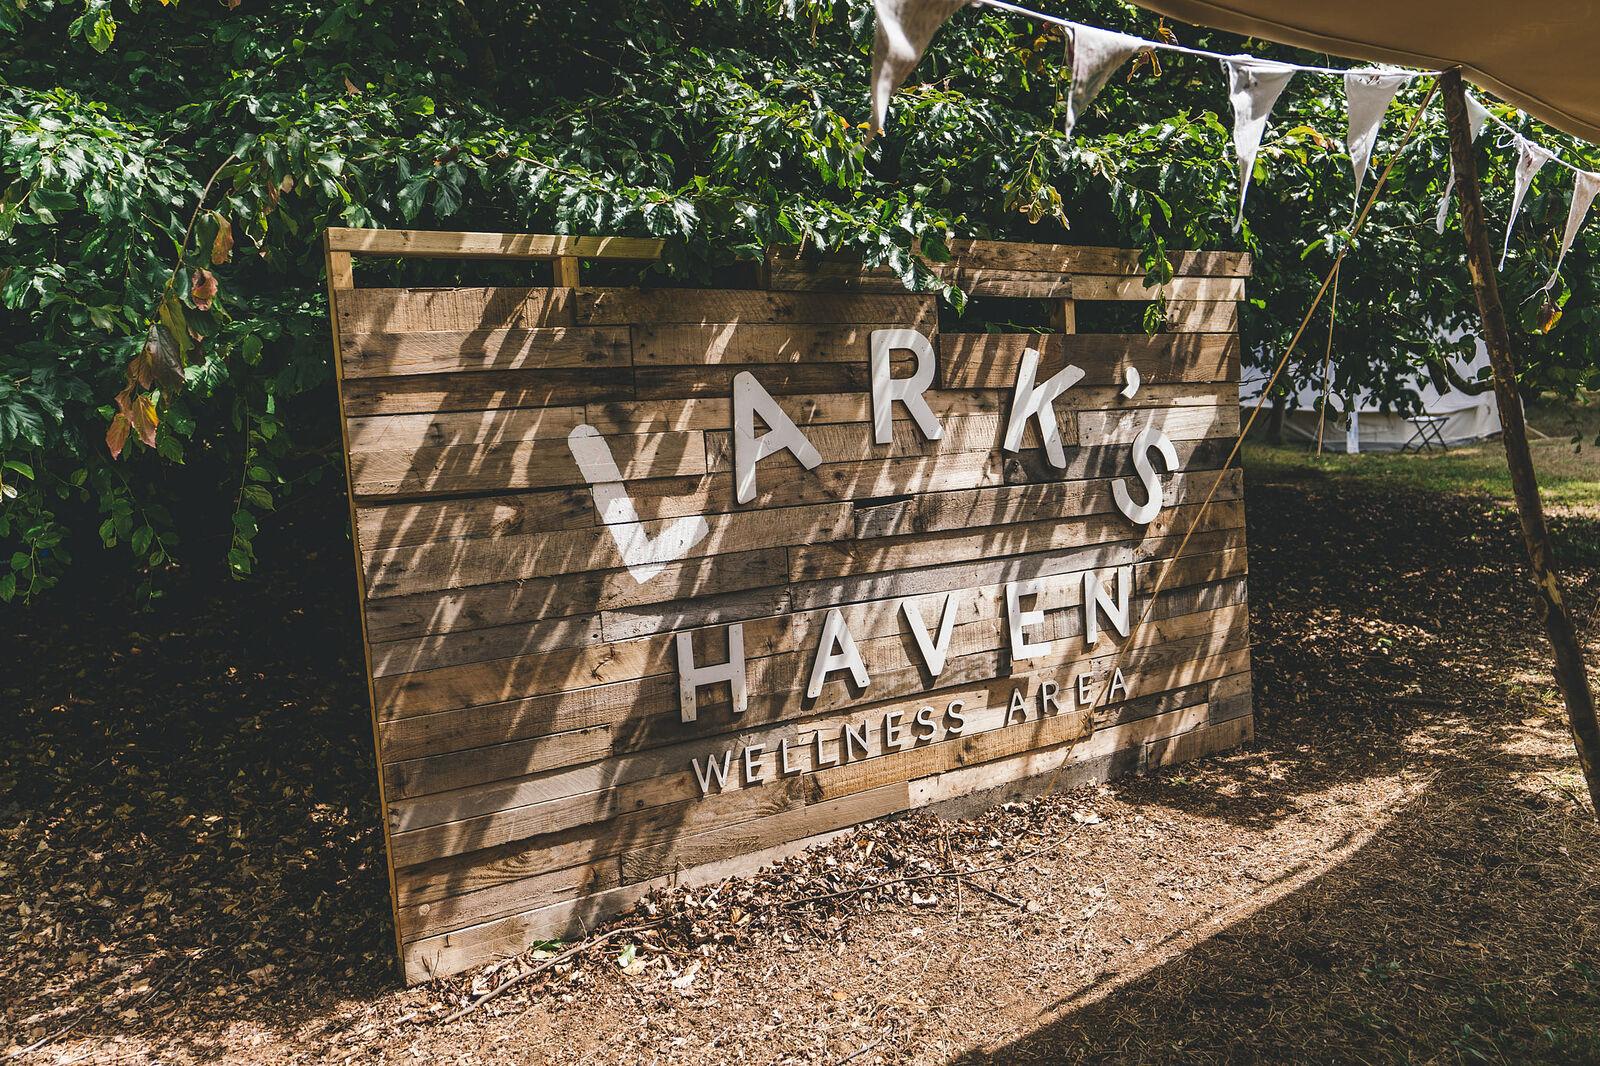 Lark's Haven